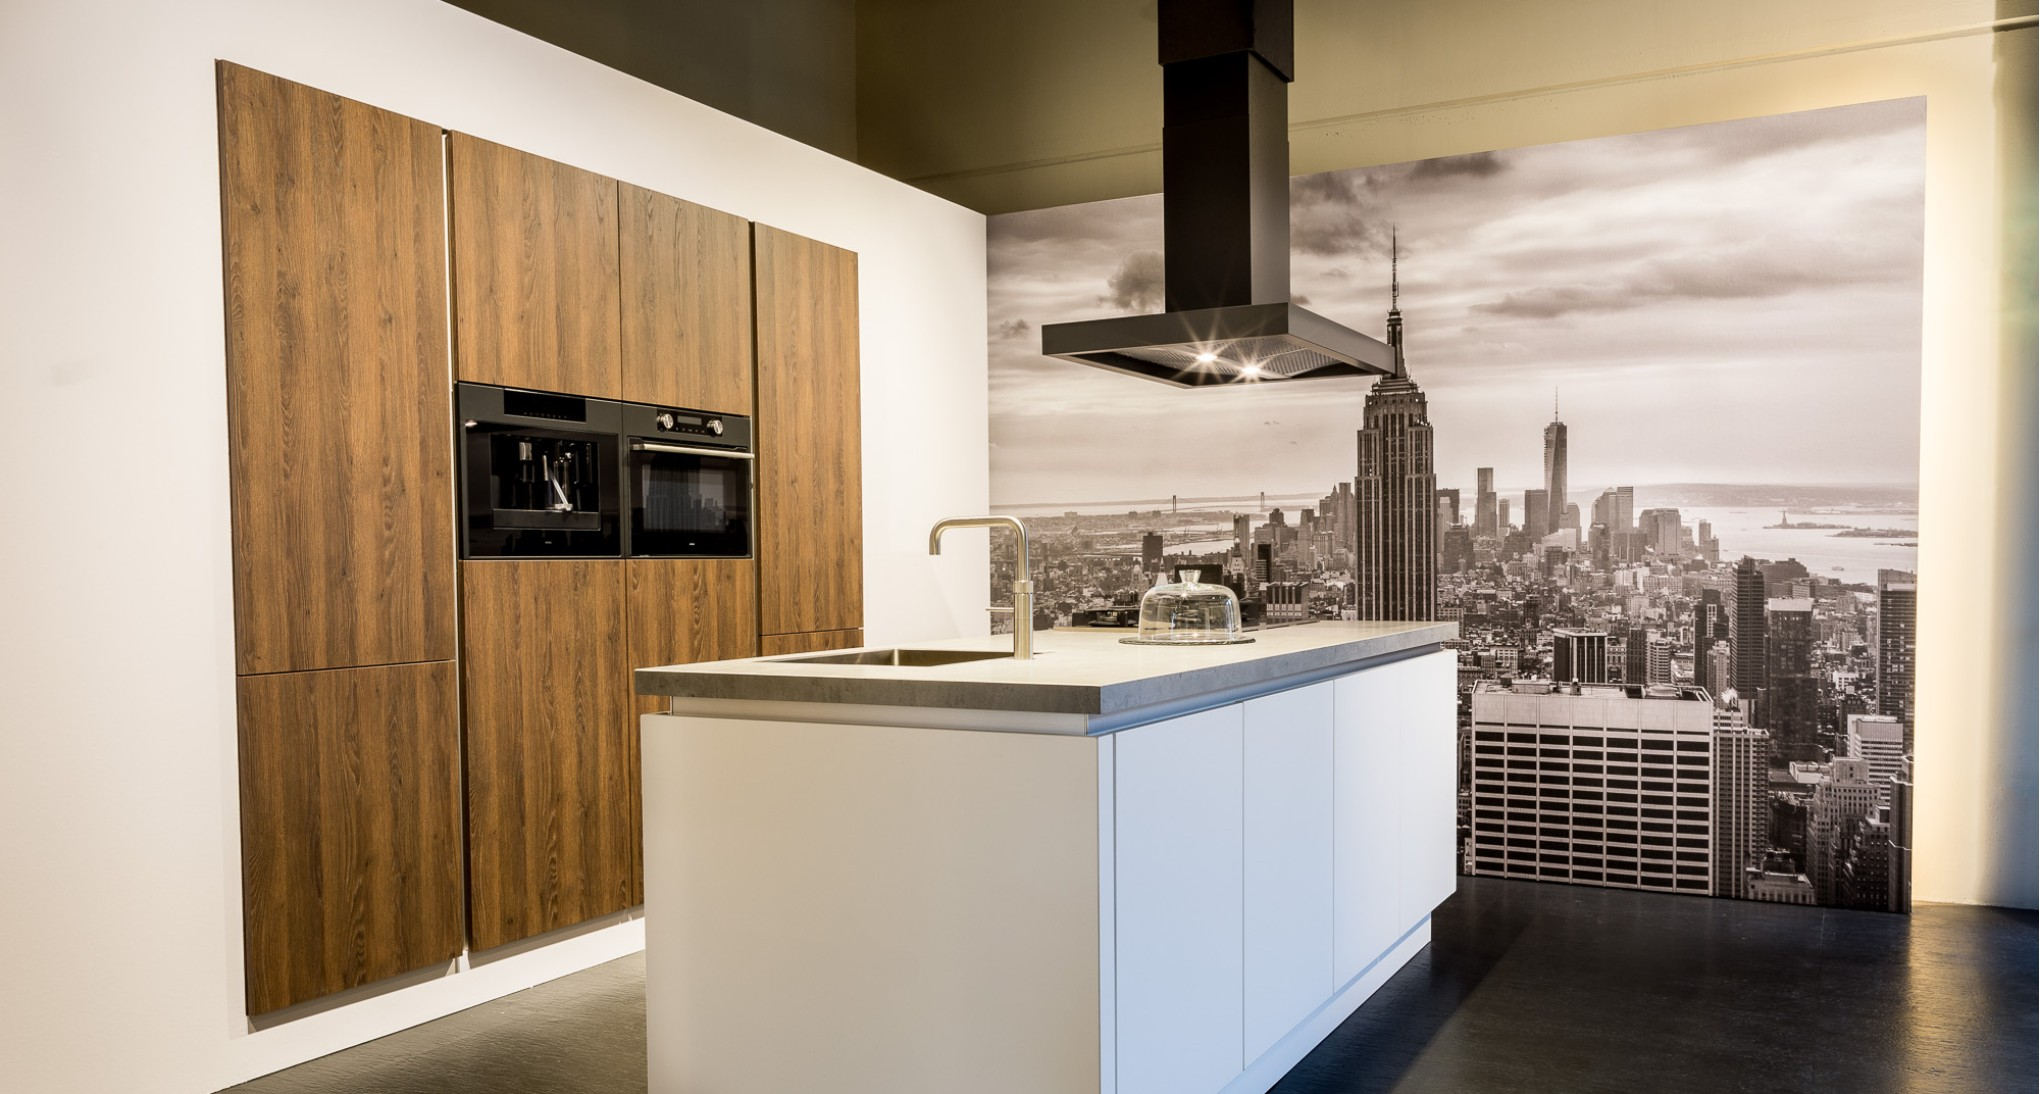 Concordia keuken & bad keukens moderne greeploze keuken